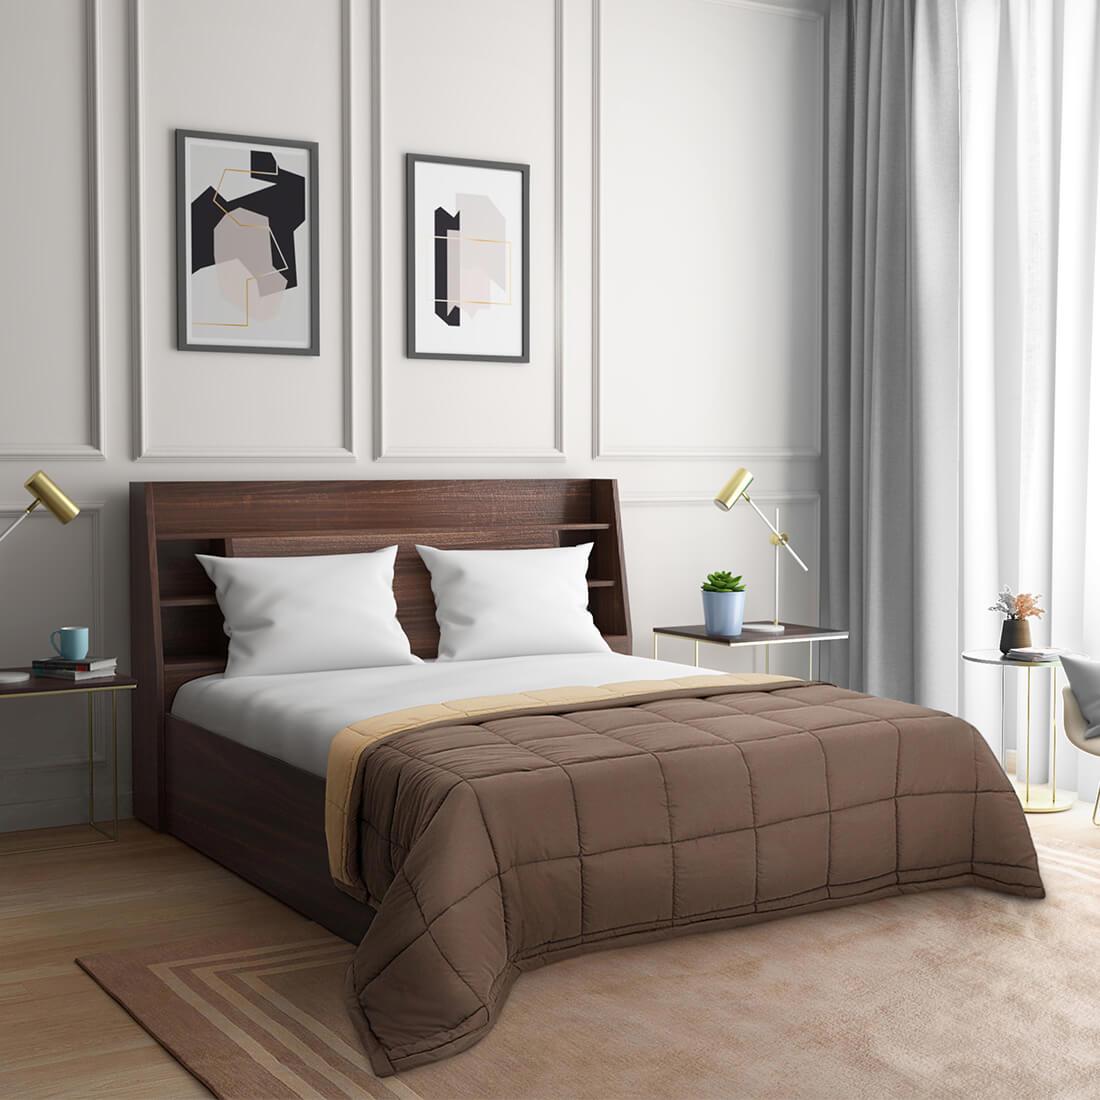 Wakefit Single Siliconised Microfibre Reversible Comforter